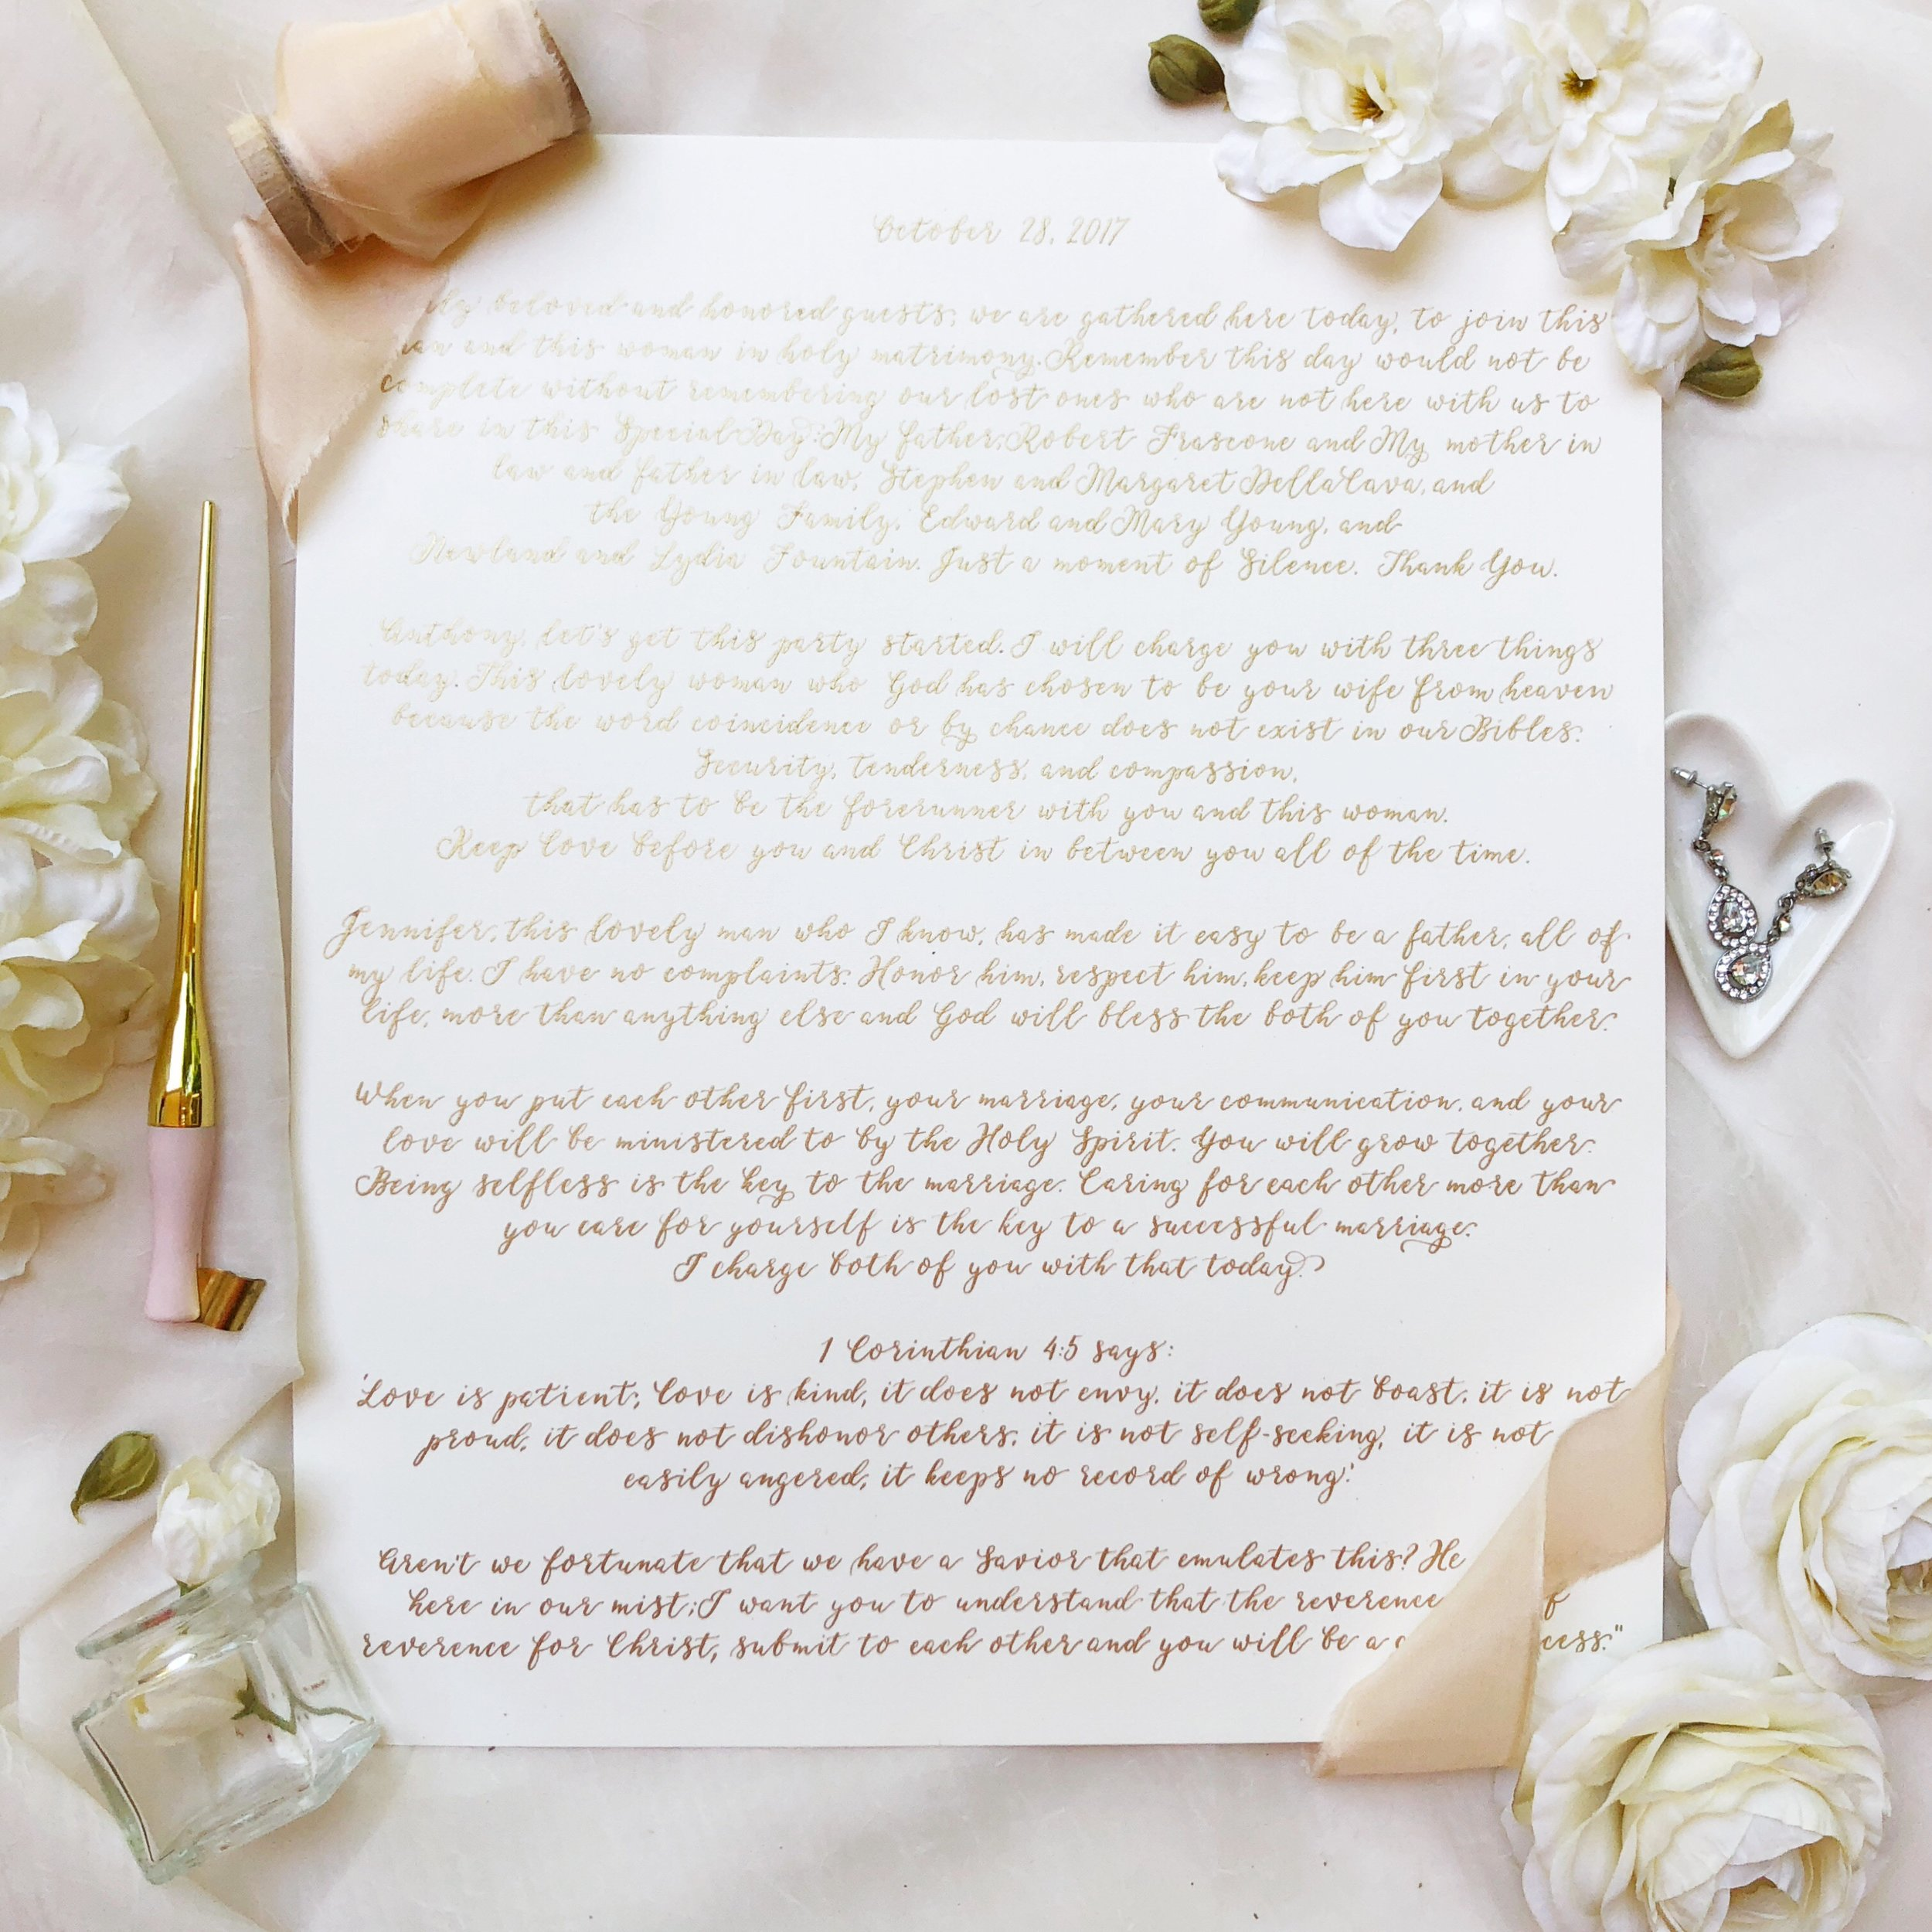 Central PA, York PA, JesSmith Designs, custom, wedding, invitations, bridal, Harrisburg, hanover, calligraphy, baltimore, wedding invitations, lancaster, gettysburg, 06-12 15.50.24.jpg